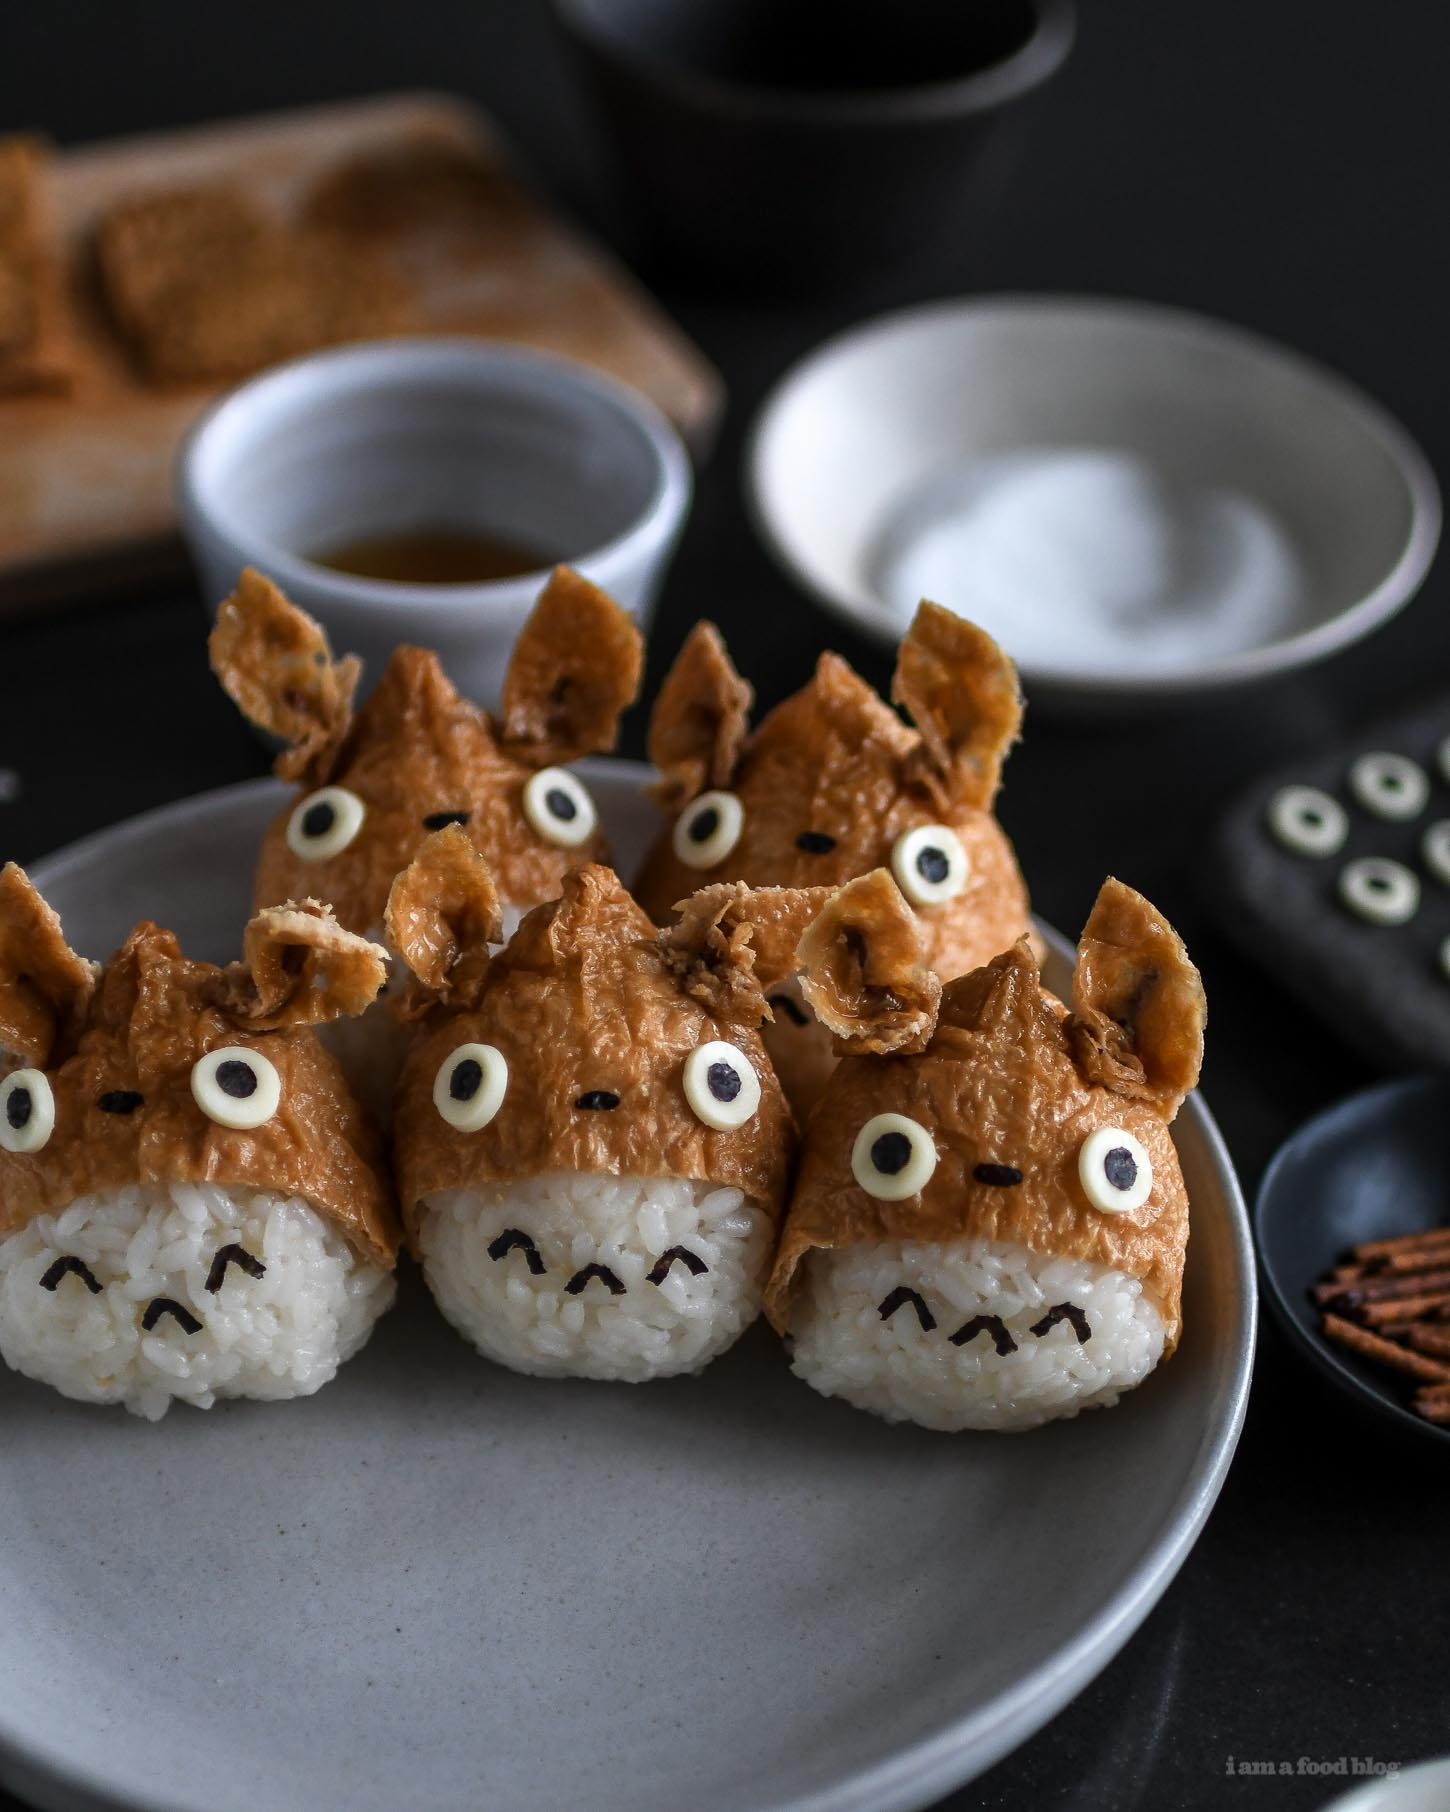 Totoro inari sushi recipe i am a food blog i am a food blog totoro inari sushi recipe iamafoodblog forumfinder Choice Image